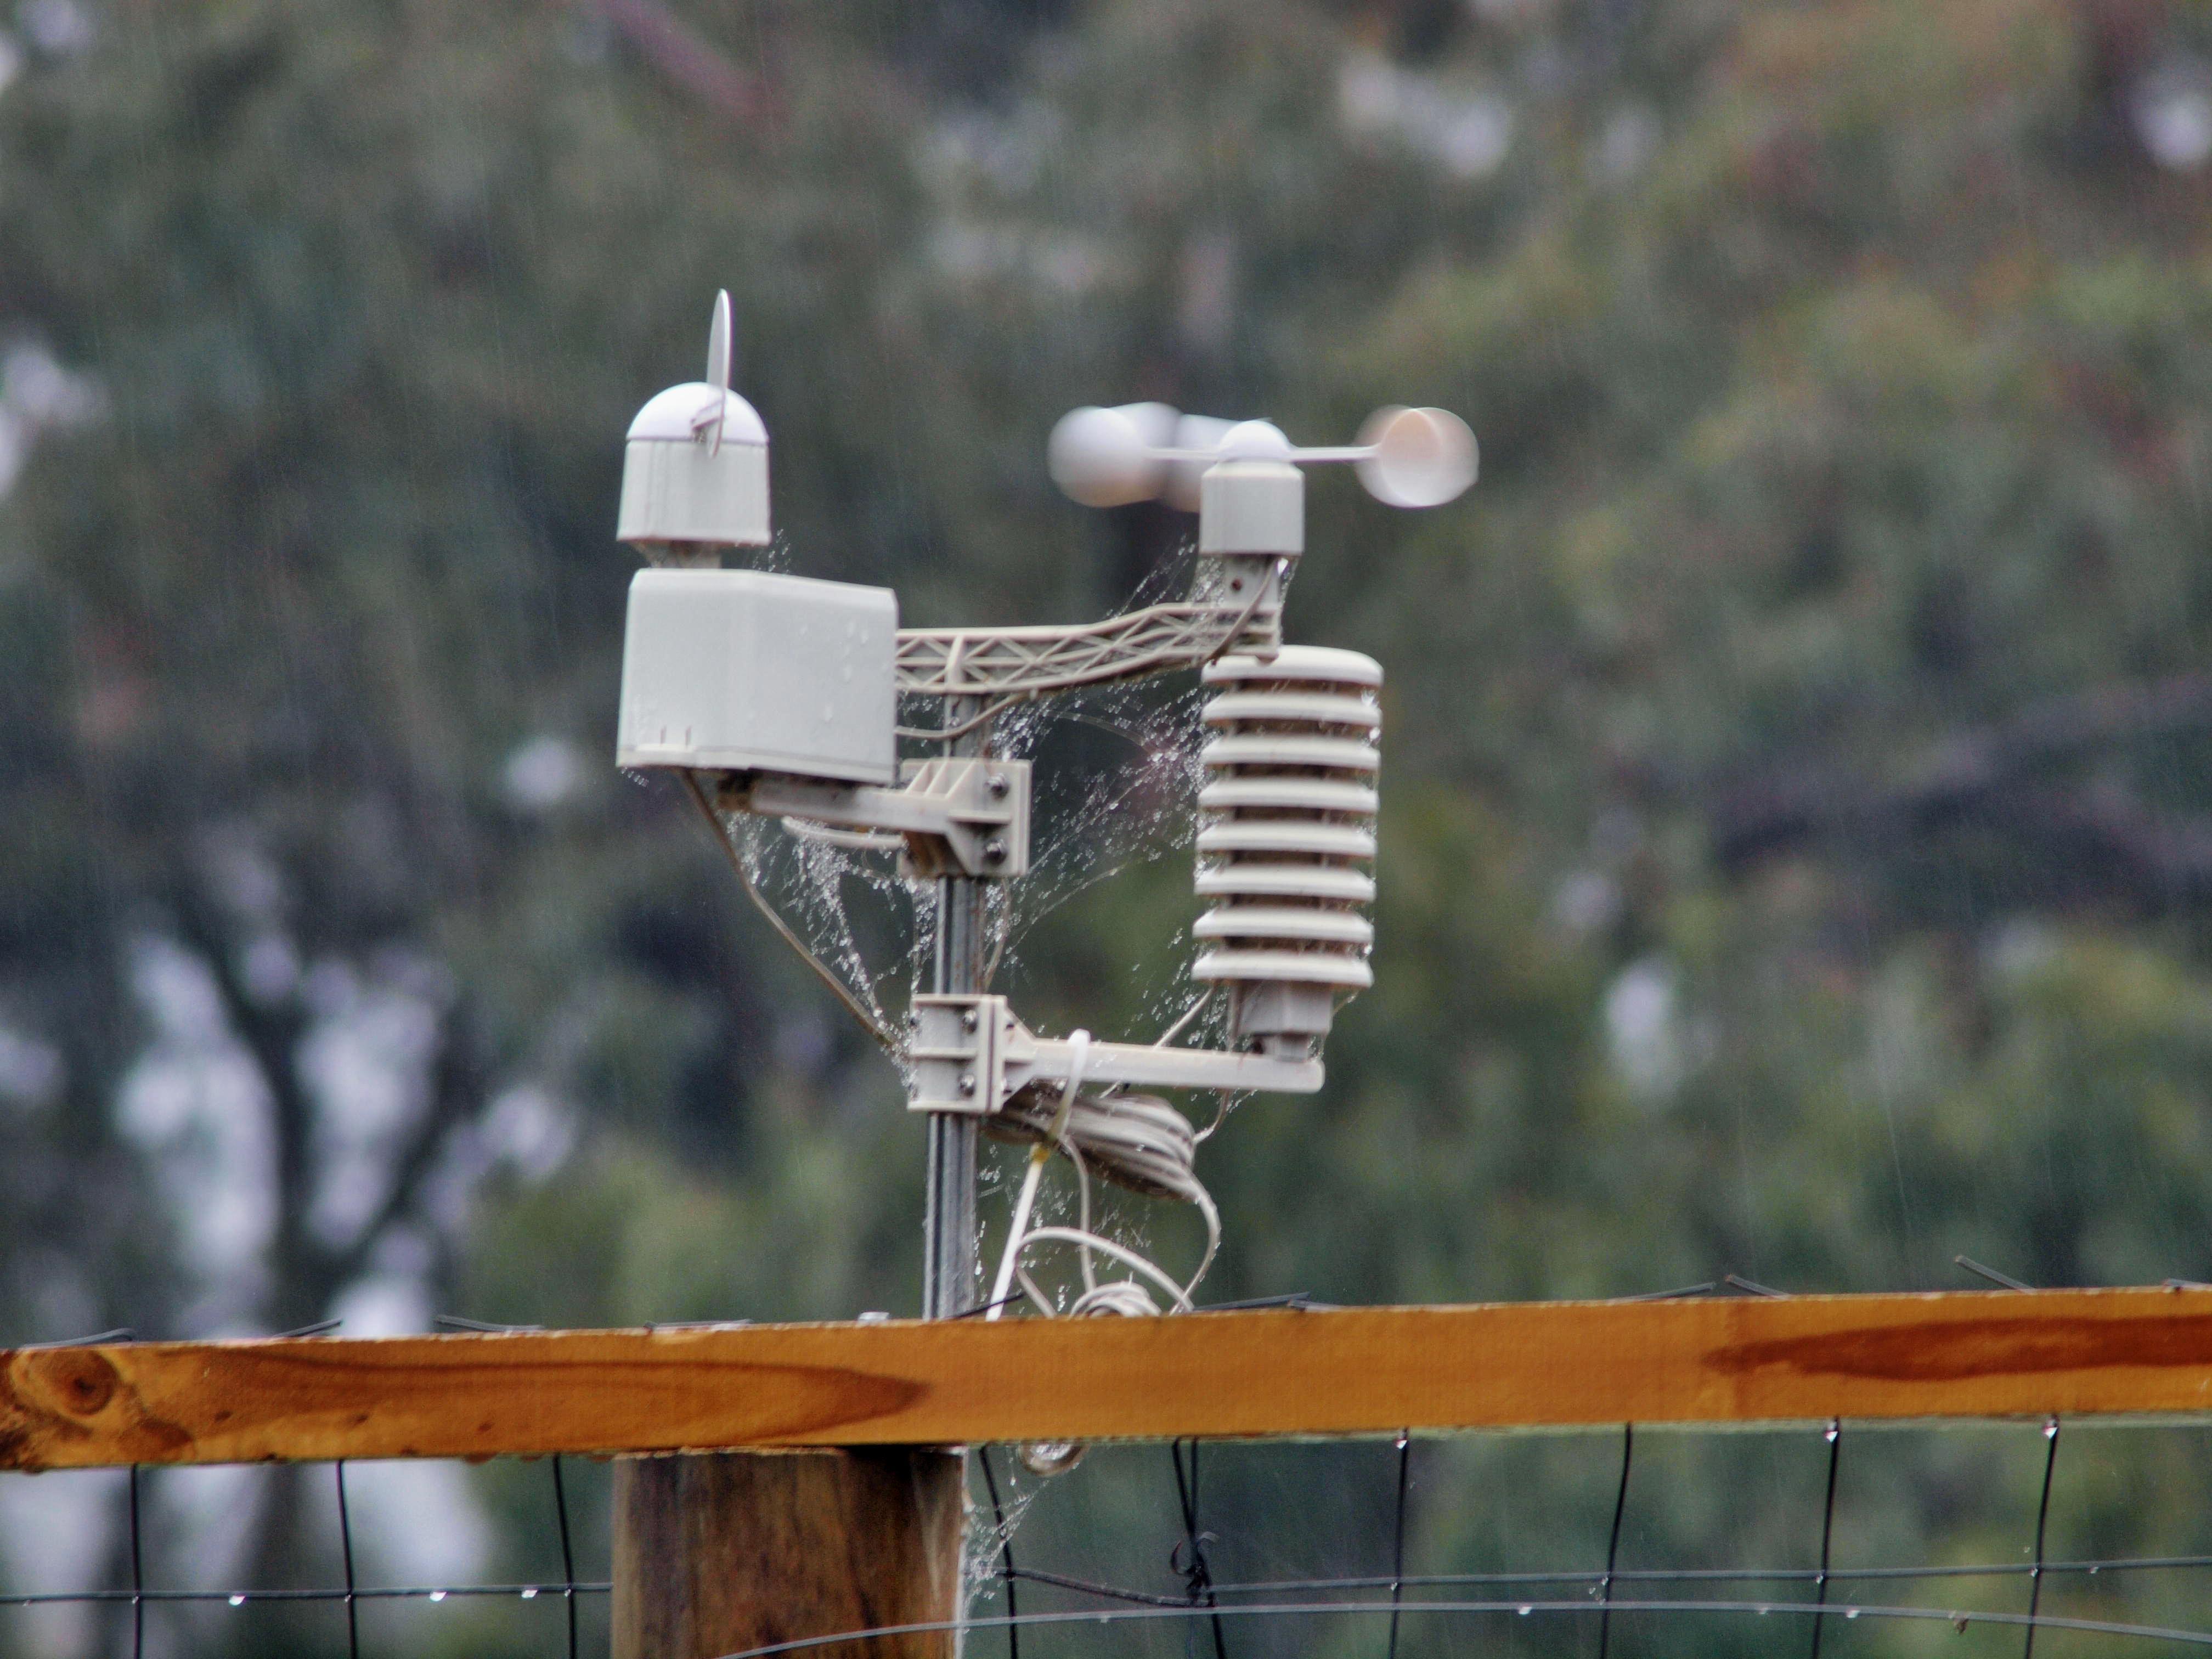 Weather-station-Hanimex-300mm-11-unstabilized.jpeg